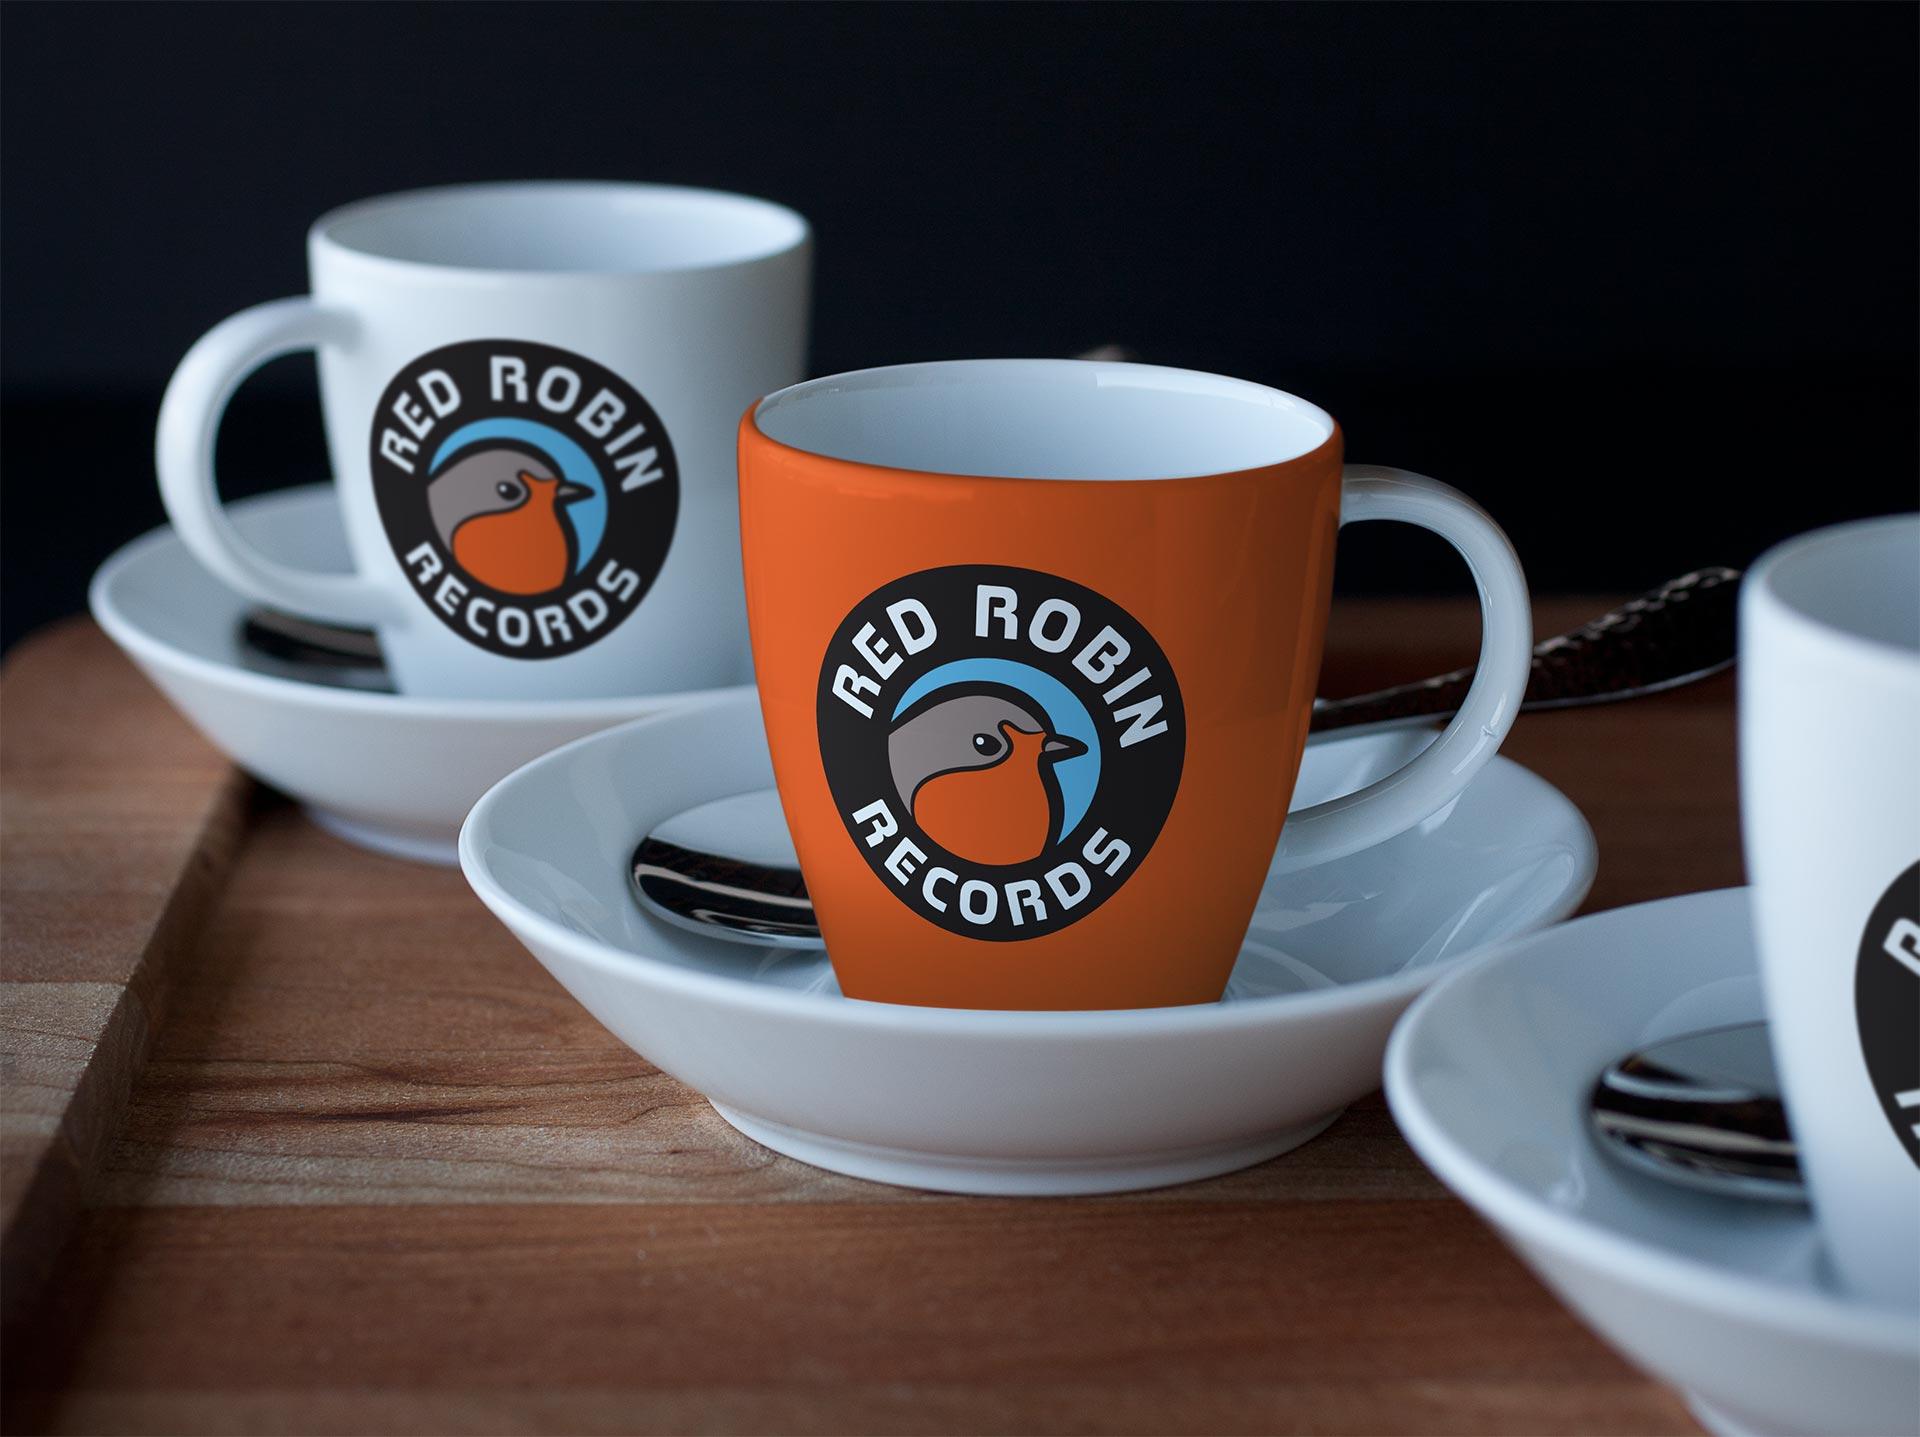 Red Robin Records Logo Design on Coffee Mug